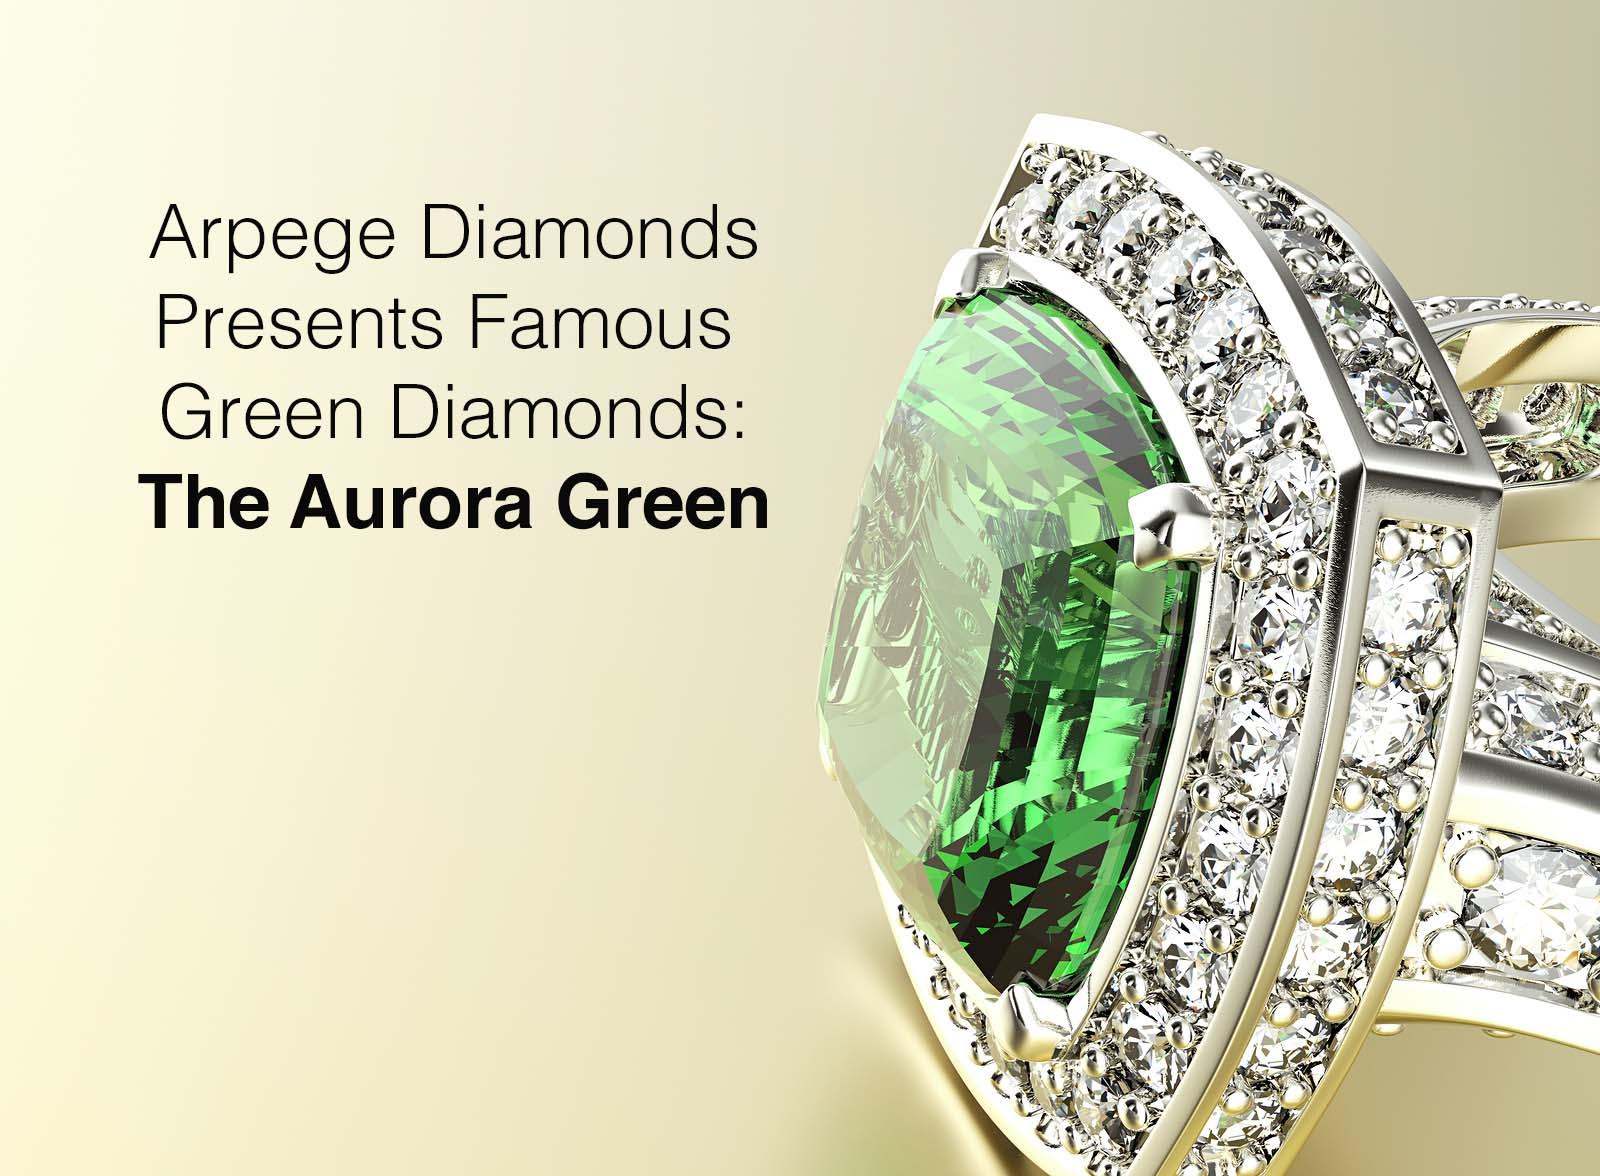 aurora_green_diamonds.jpg